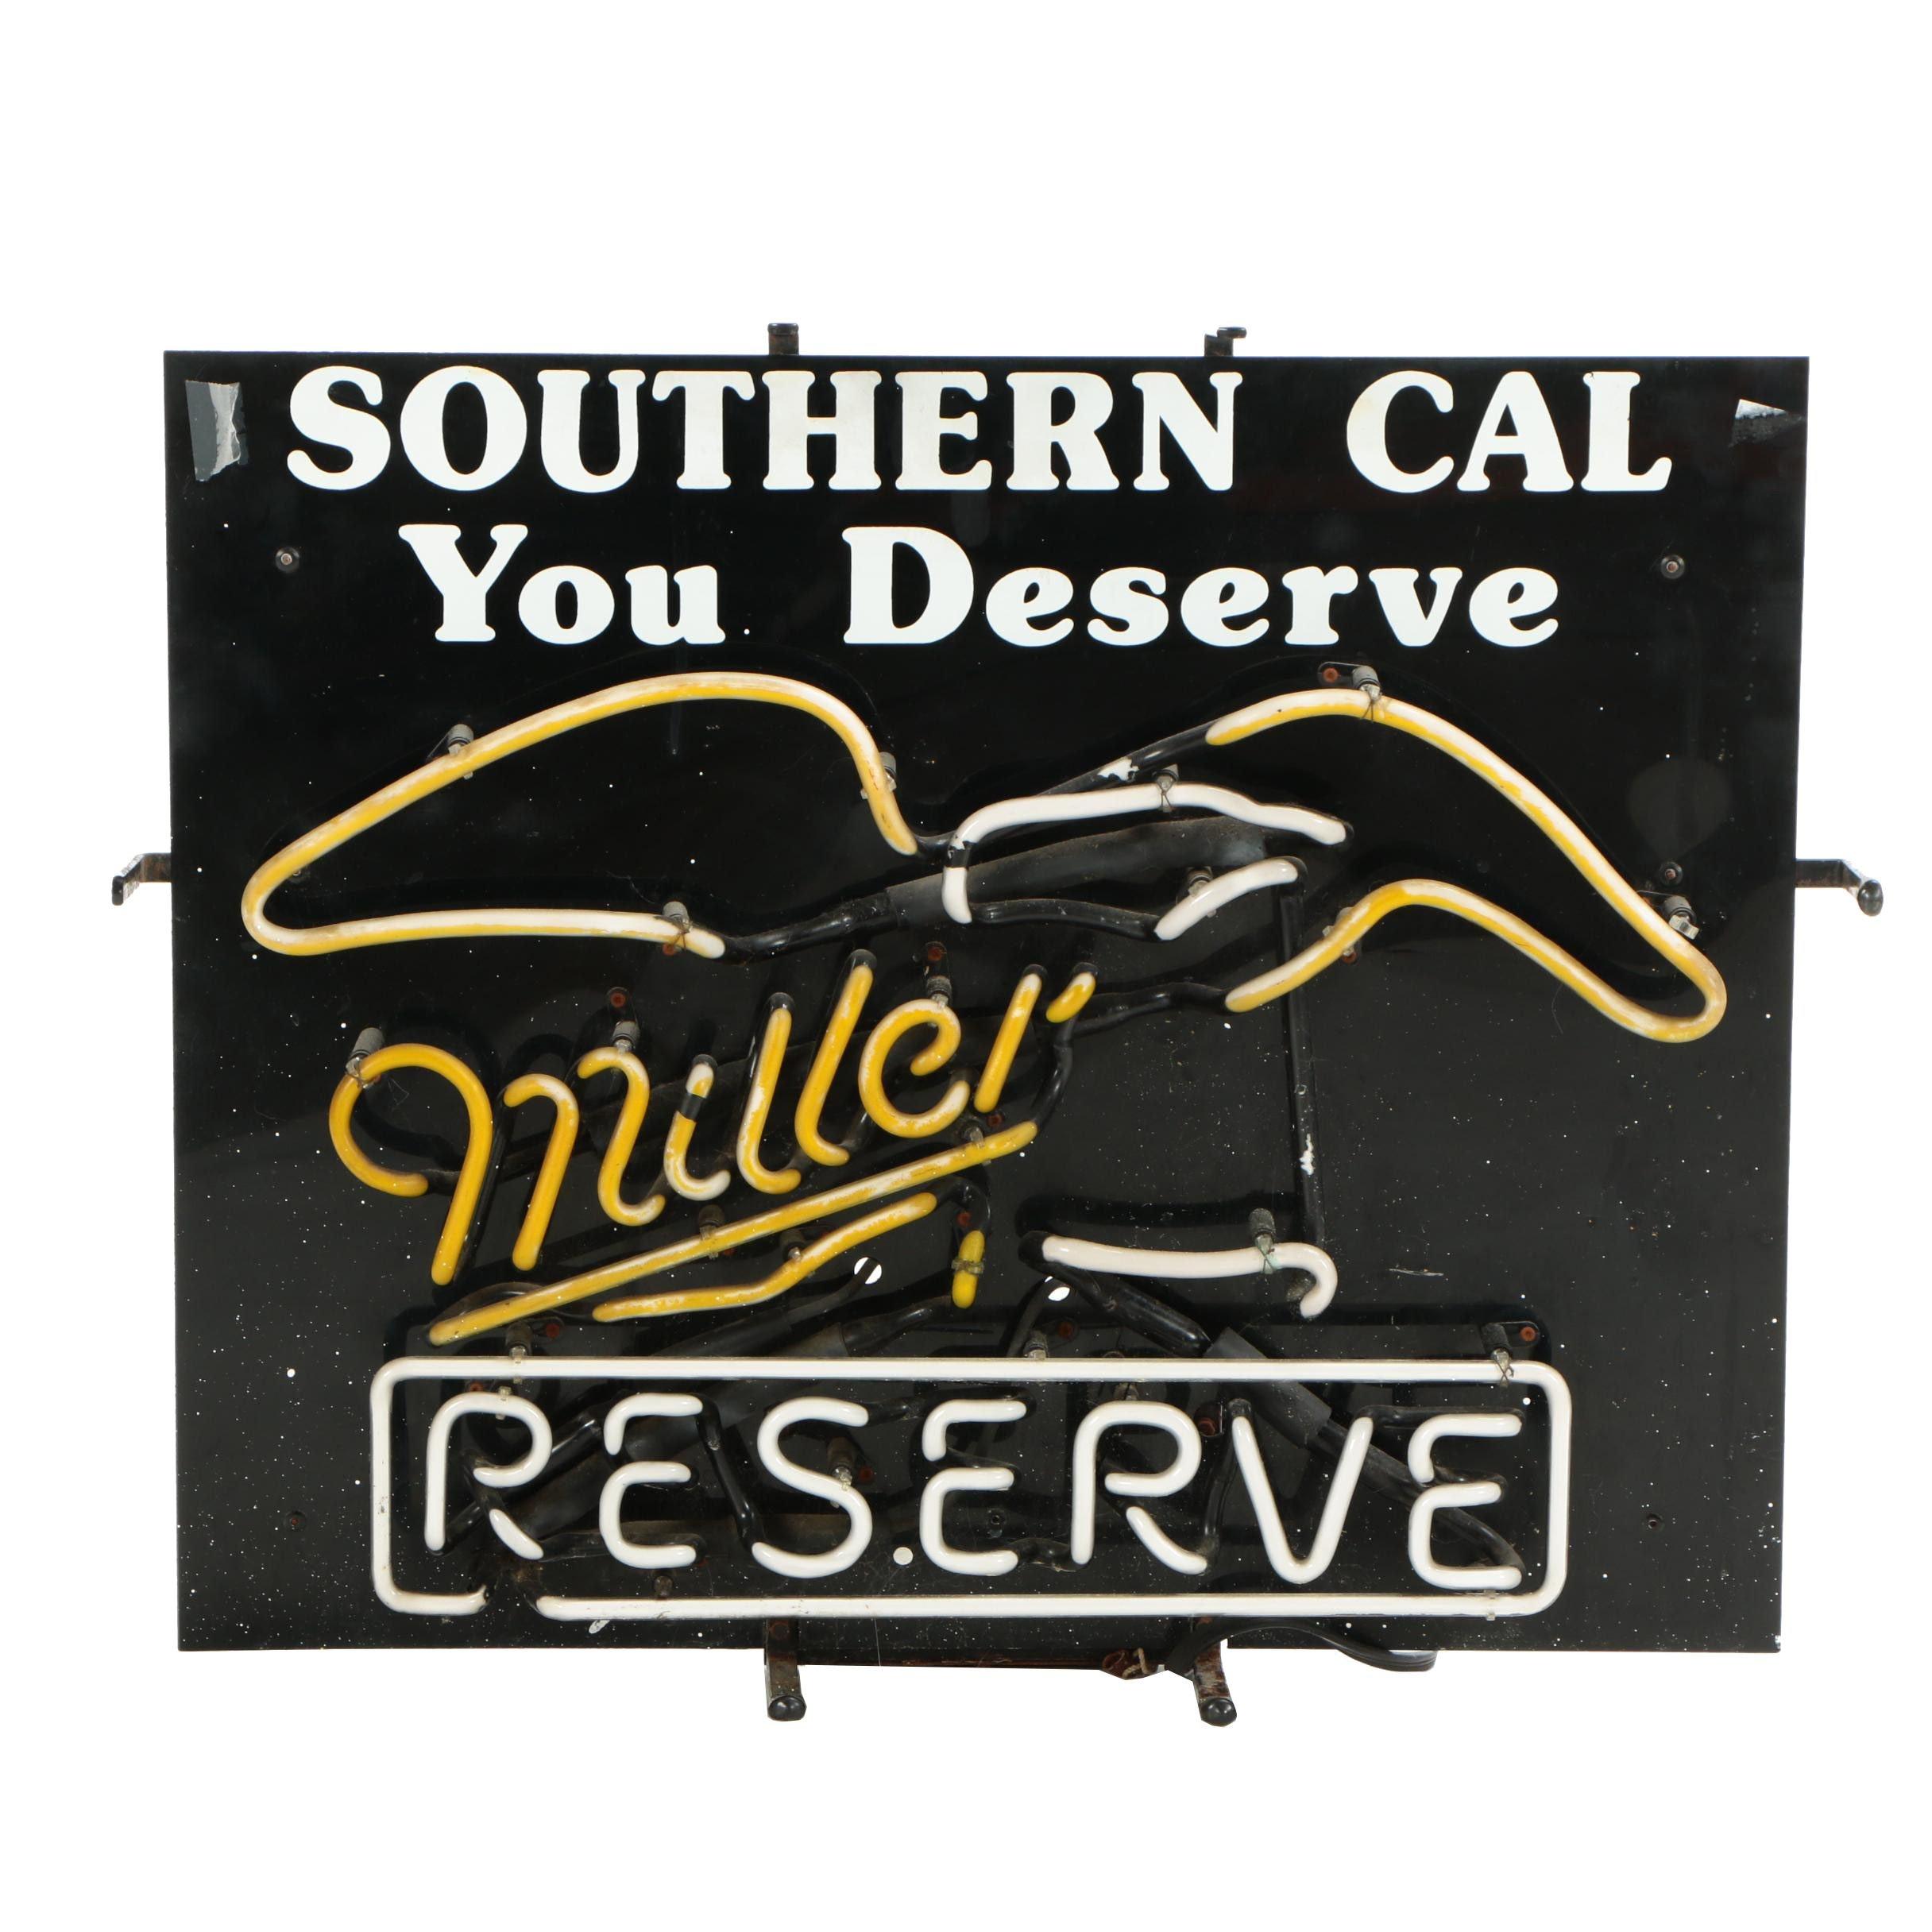 Miller Reserve Neon Advertising Sign